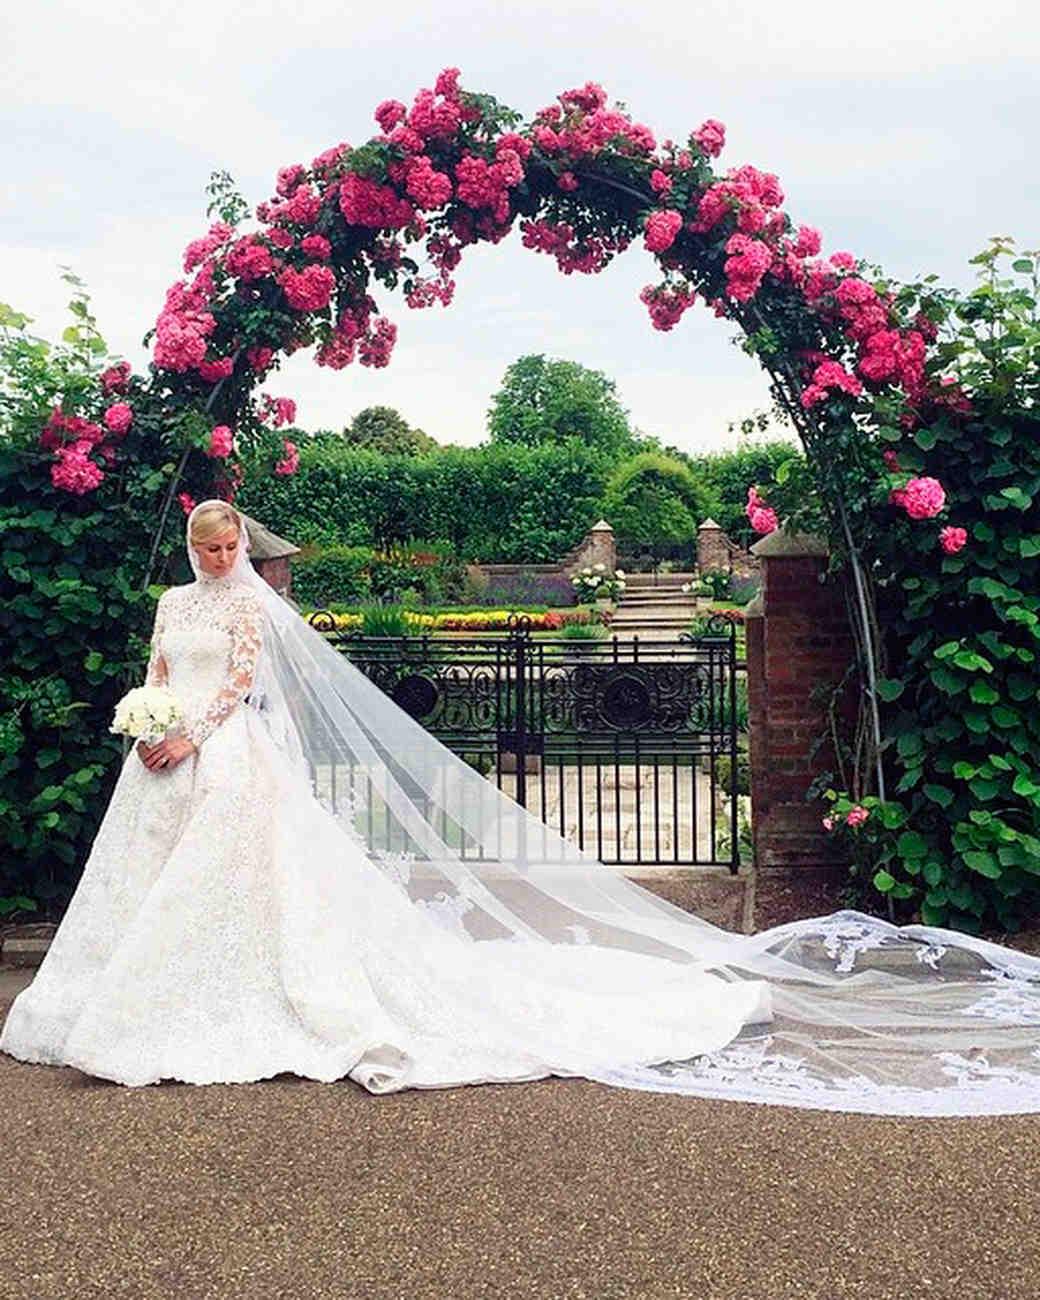 celebrity-wedding-moments-nicky-hilton-rothschild-in-dress-1215.jpg